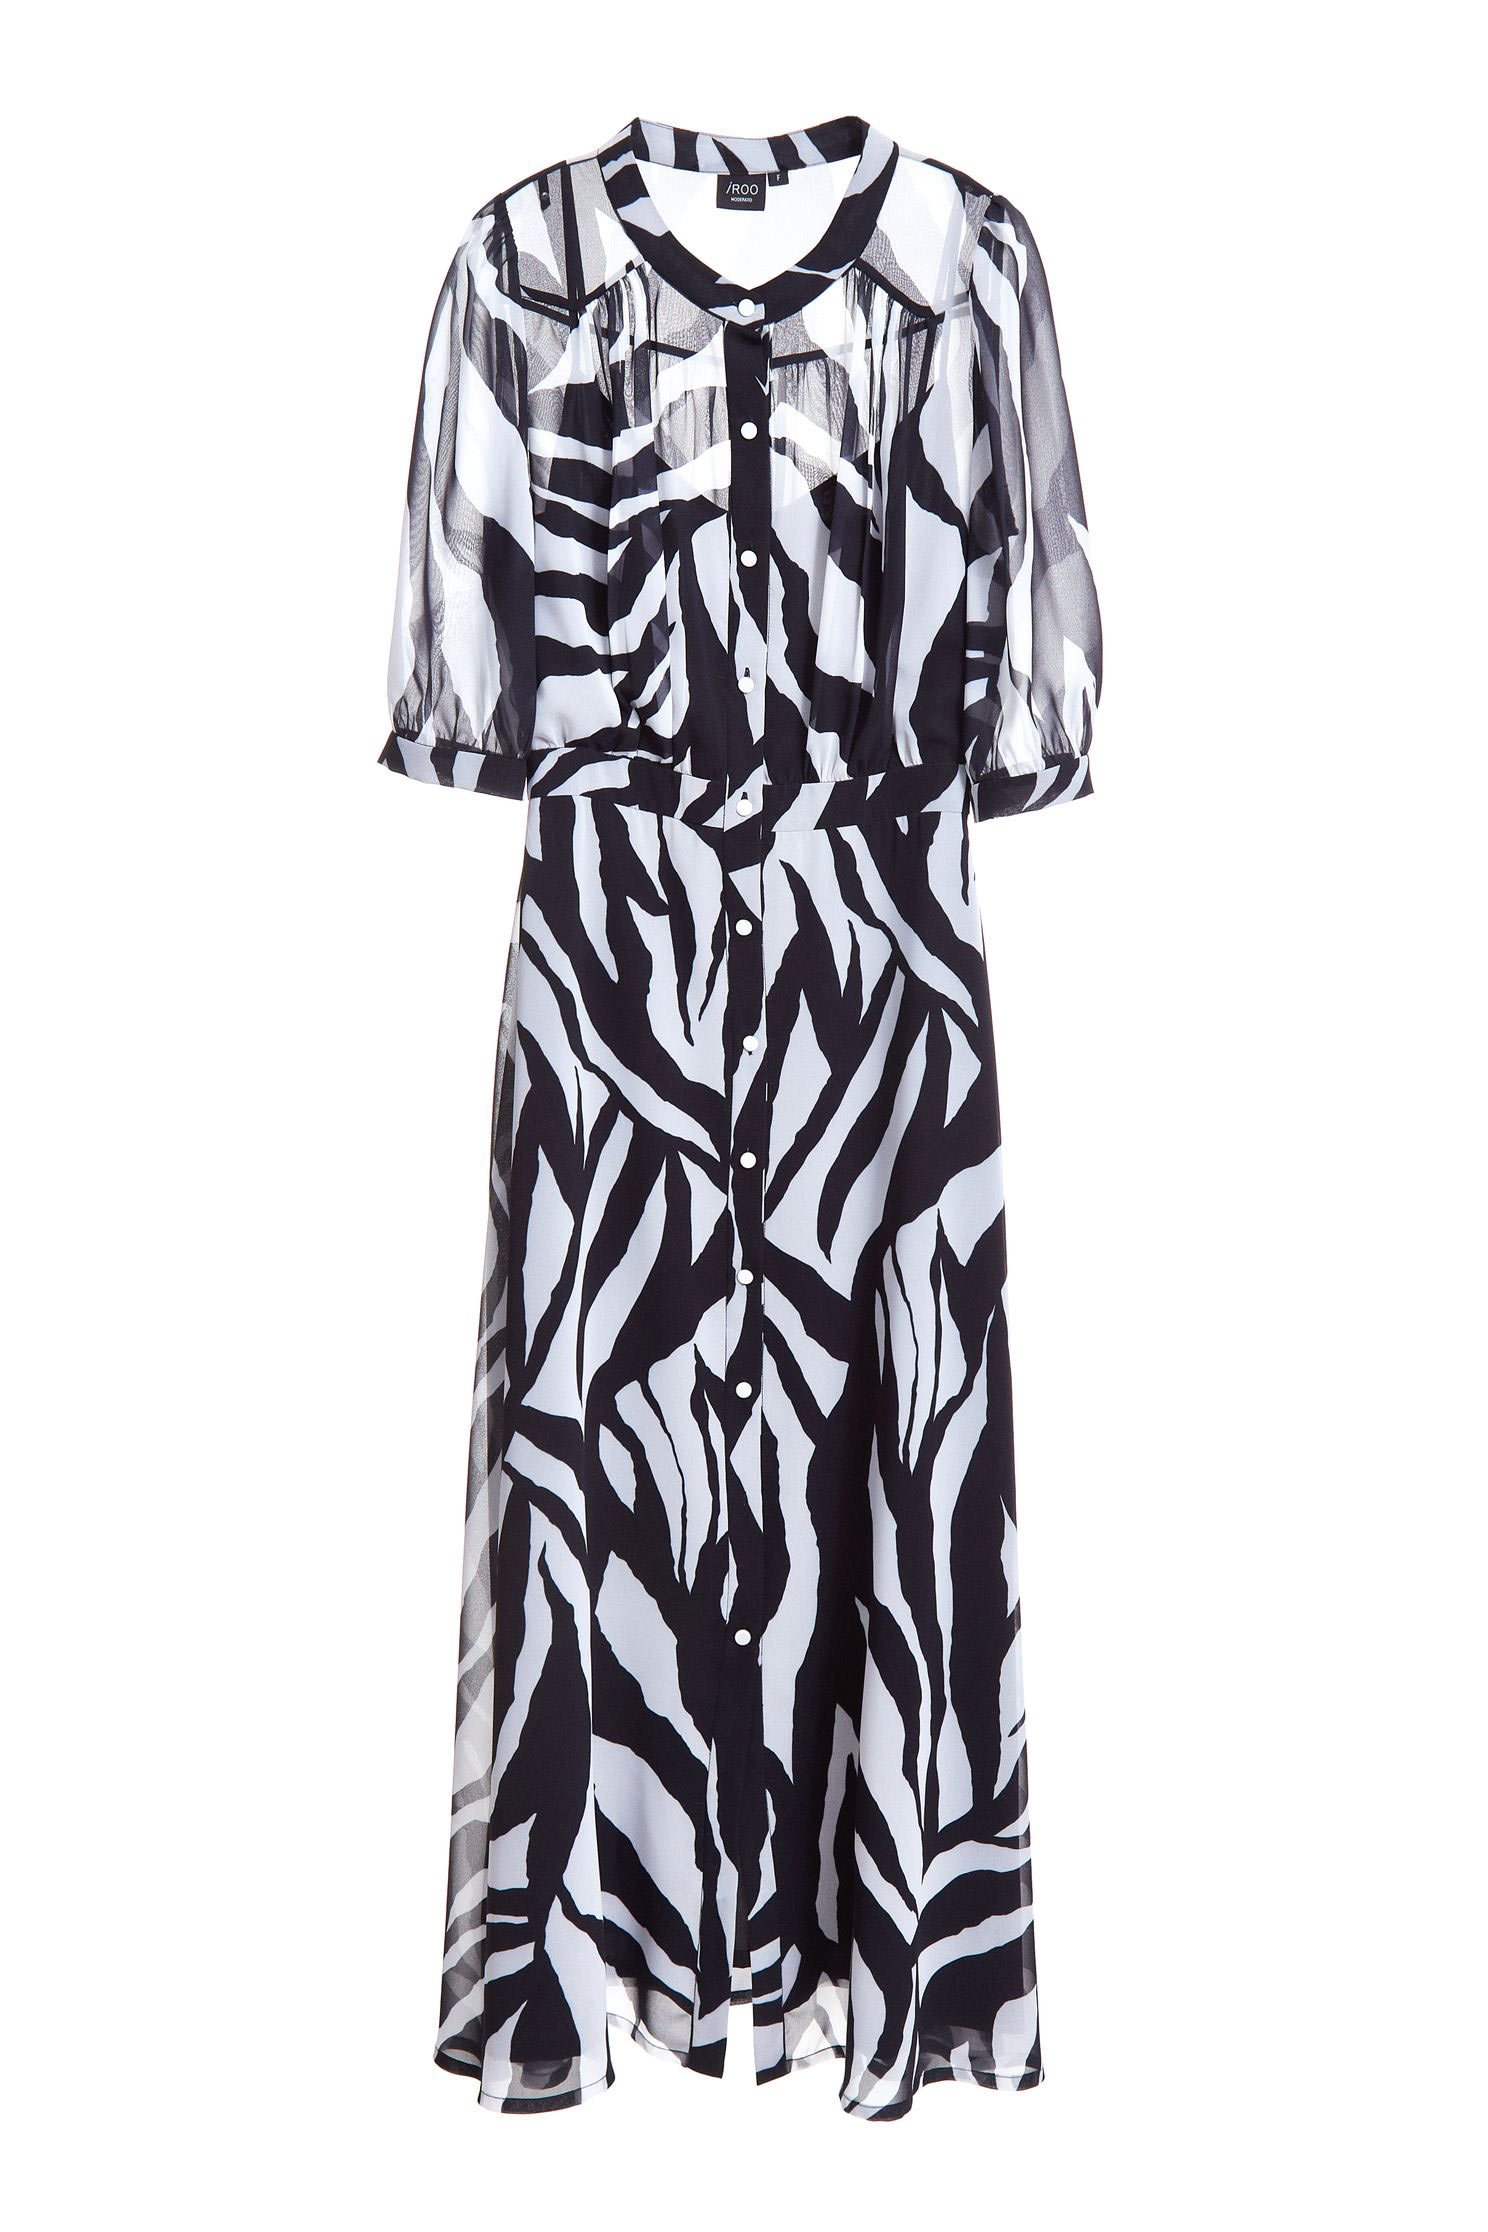 Zebra stripe classic fashion dress